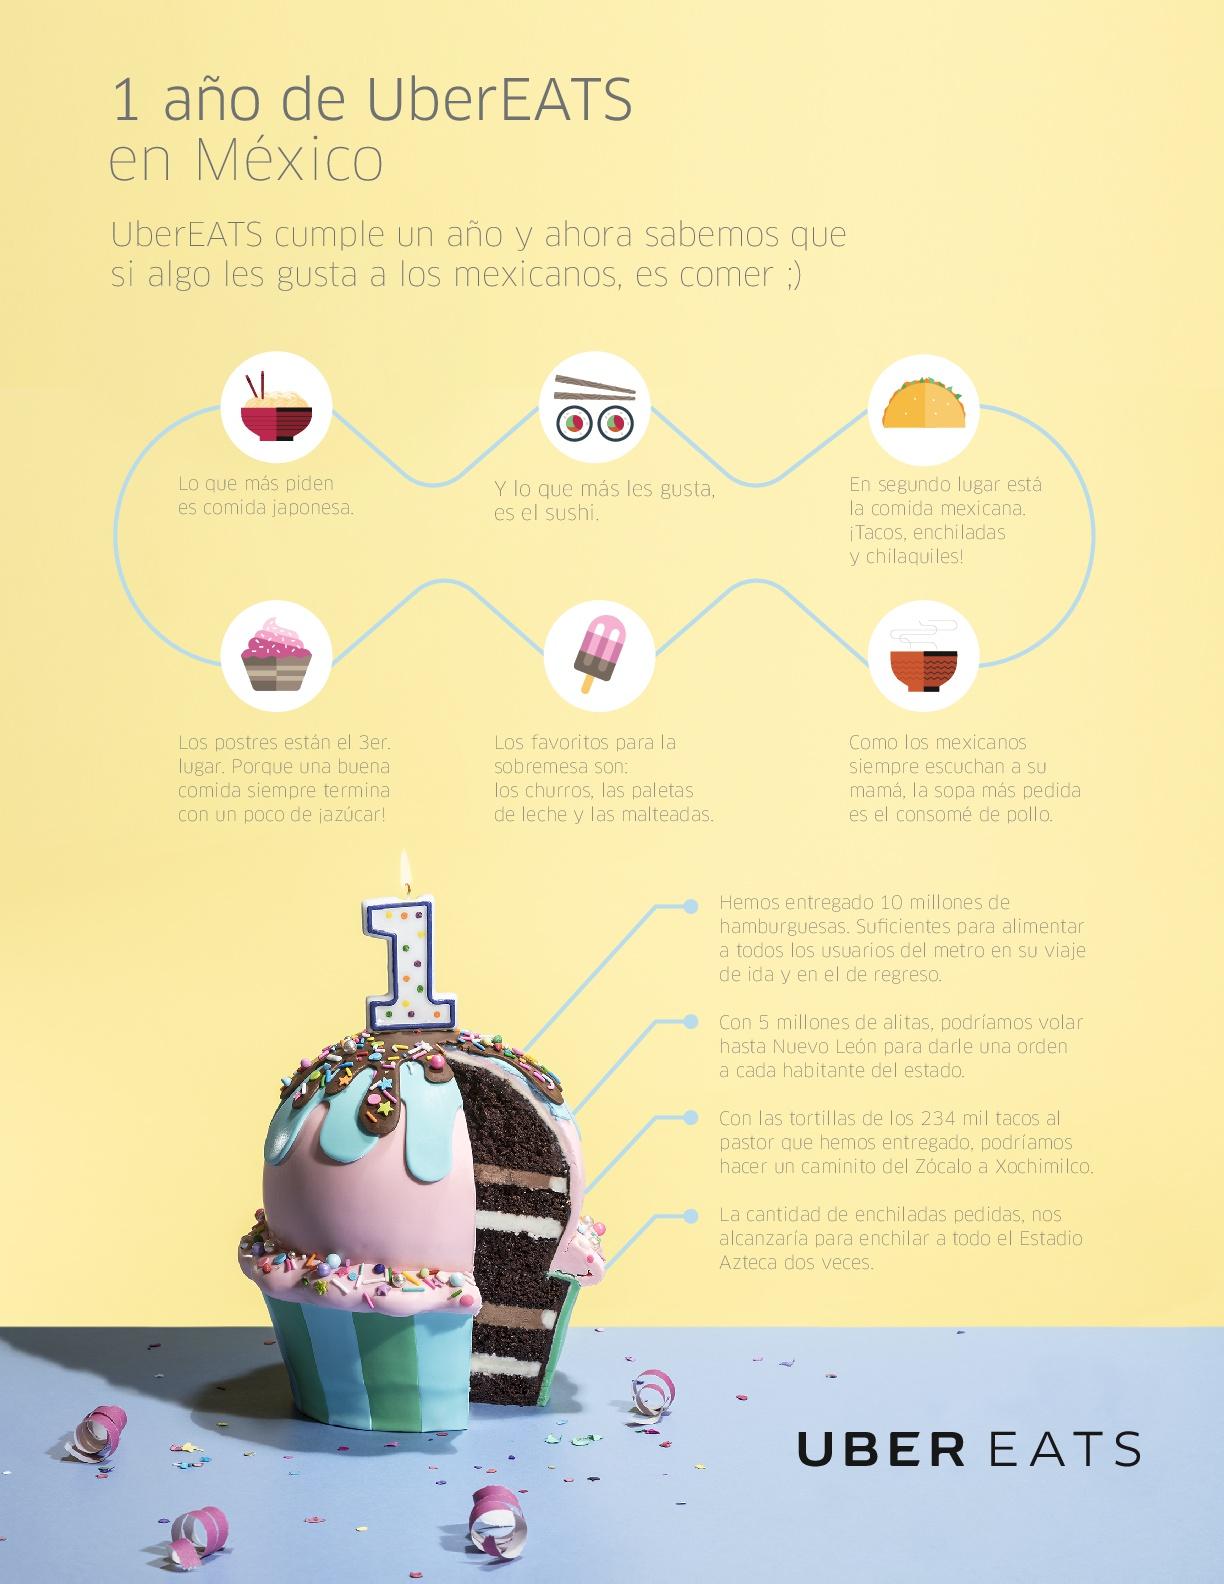 UberEATS celebra su primer aniversario en México ¡Envío gratis durante la semana! - infografia-ubereats-1eraniv-001